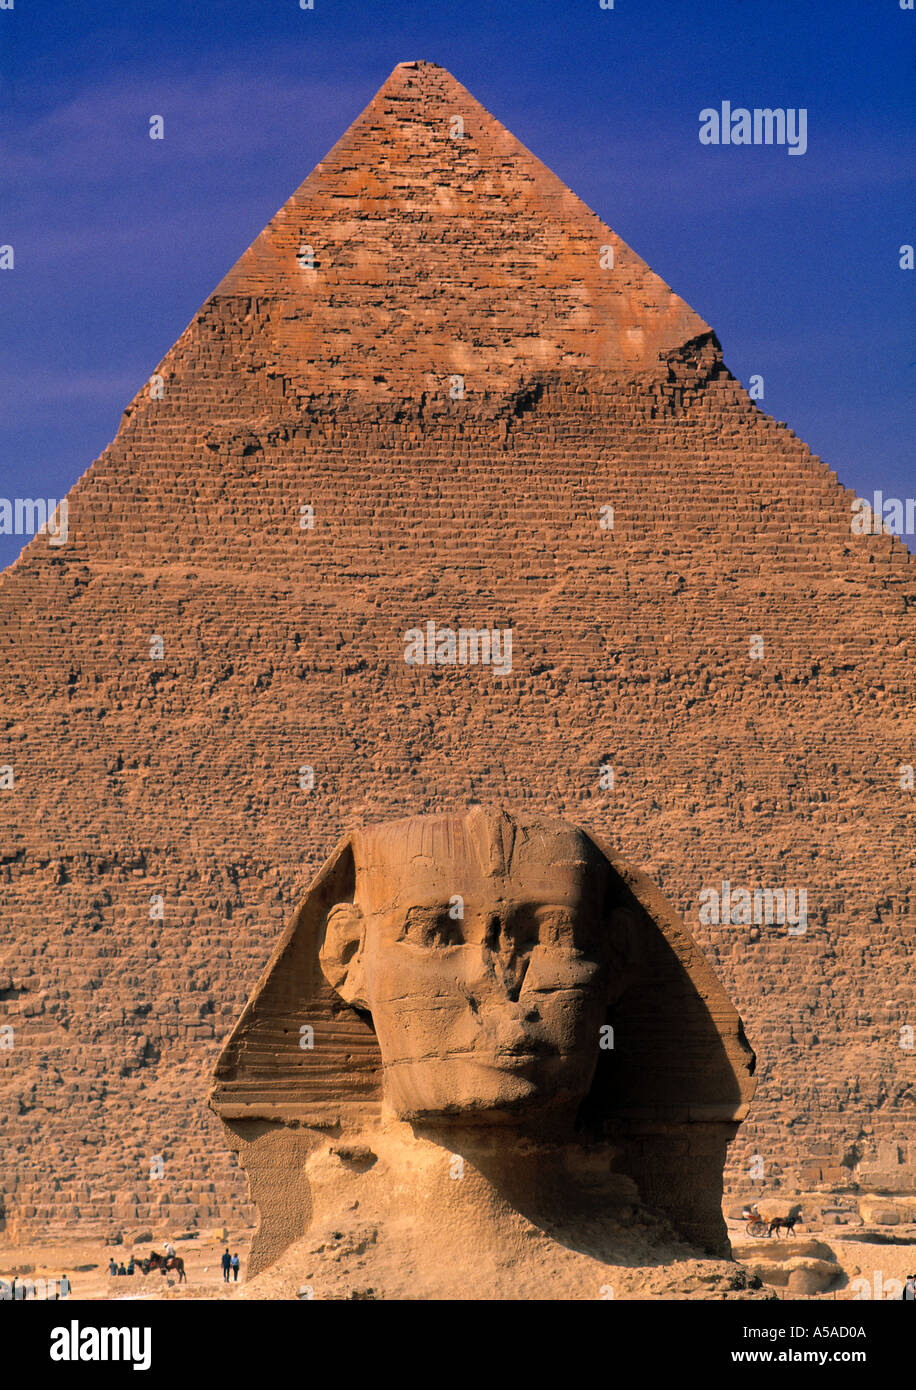 Pyramid and Sphinx, Giza, Cairo, Egypt - Stock Image